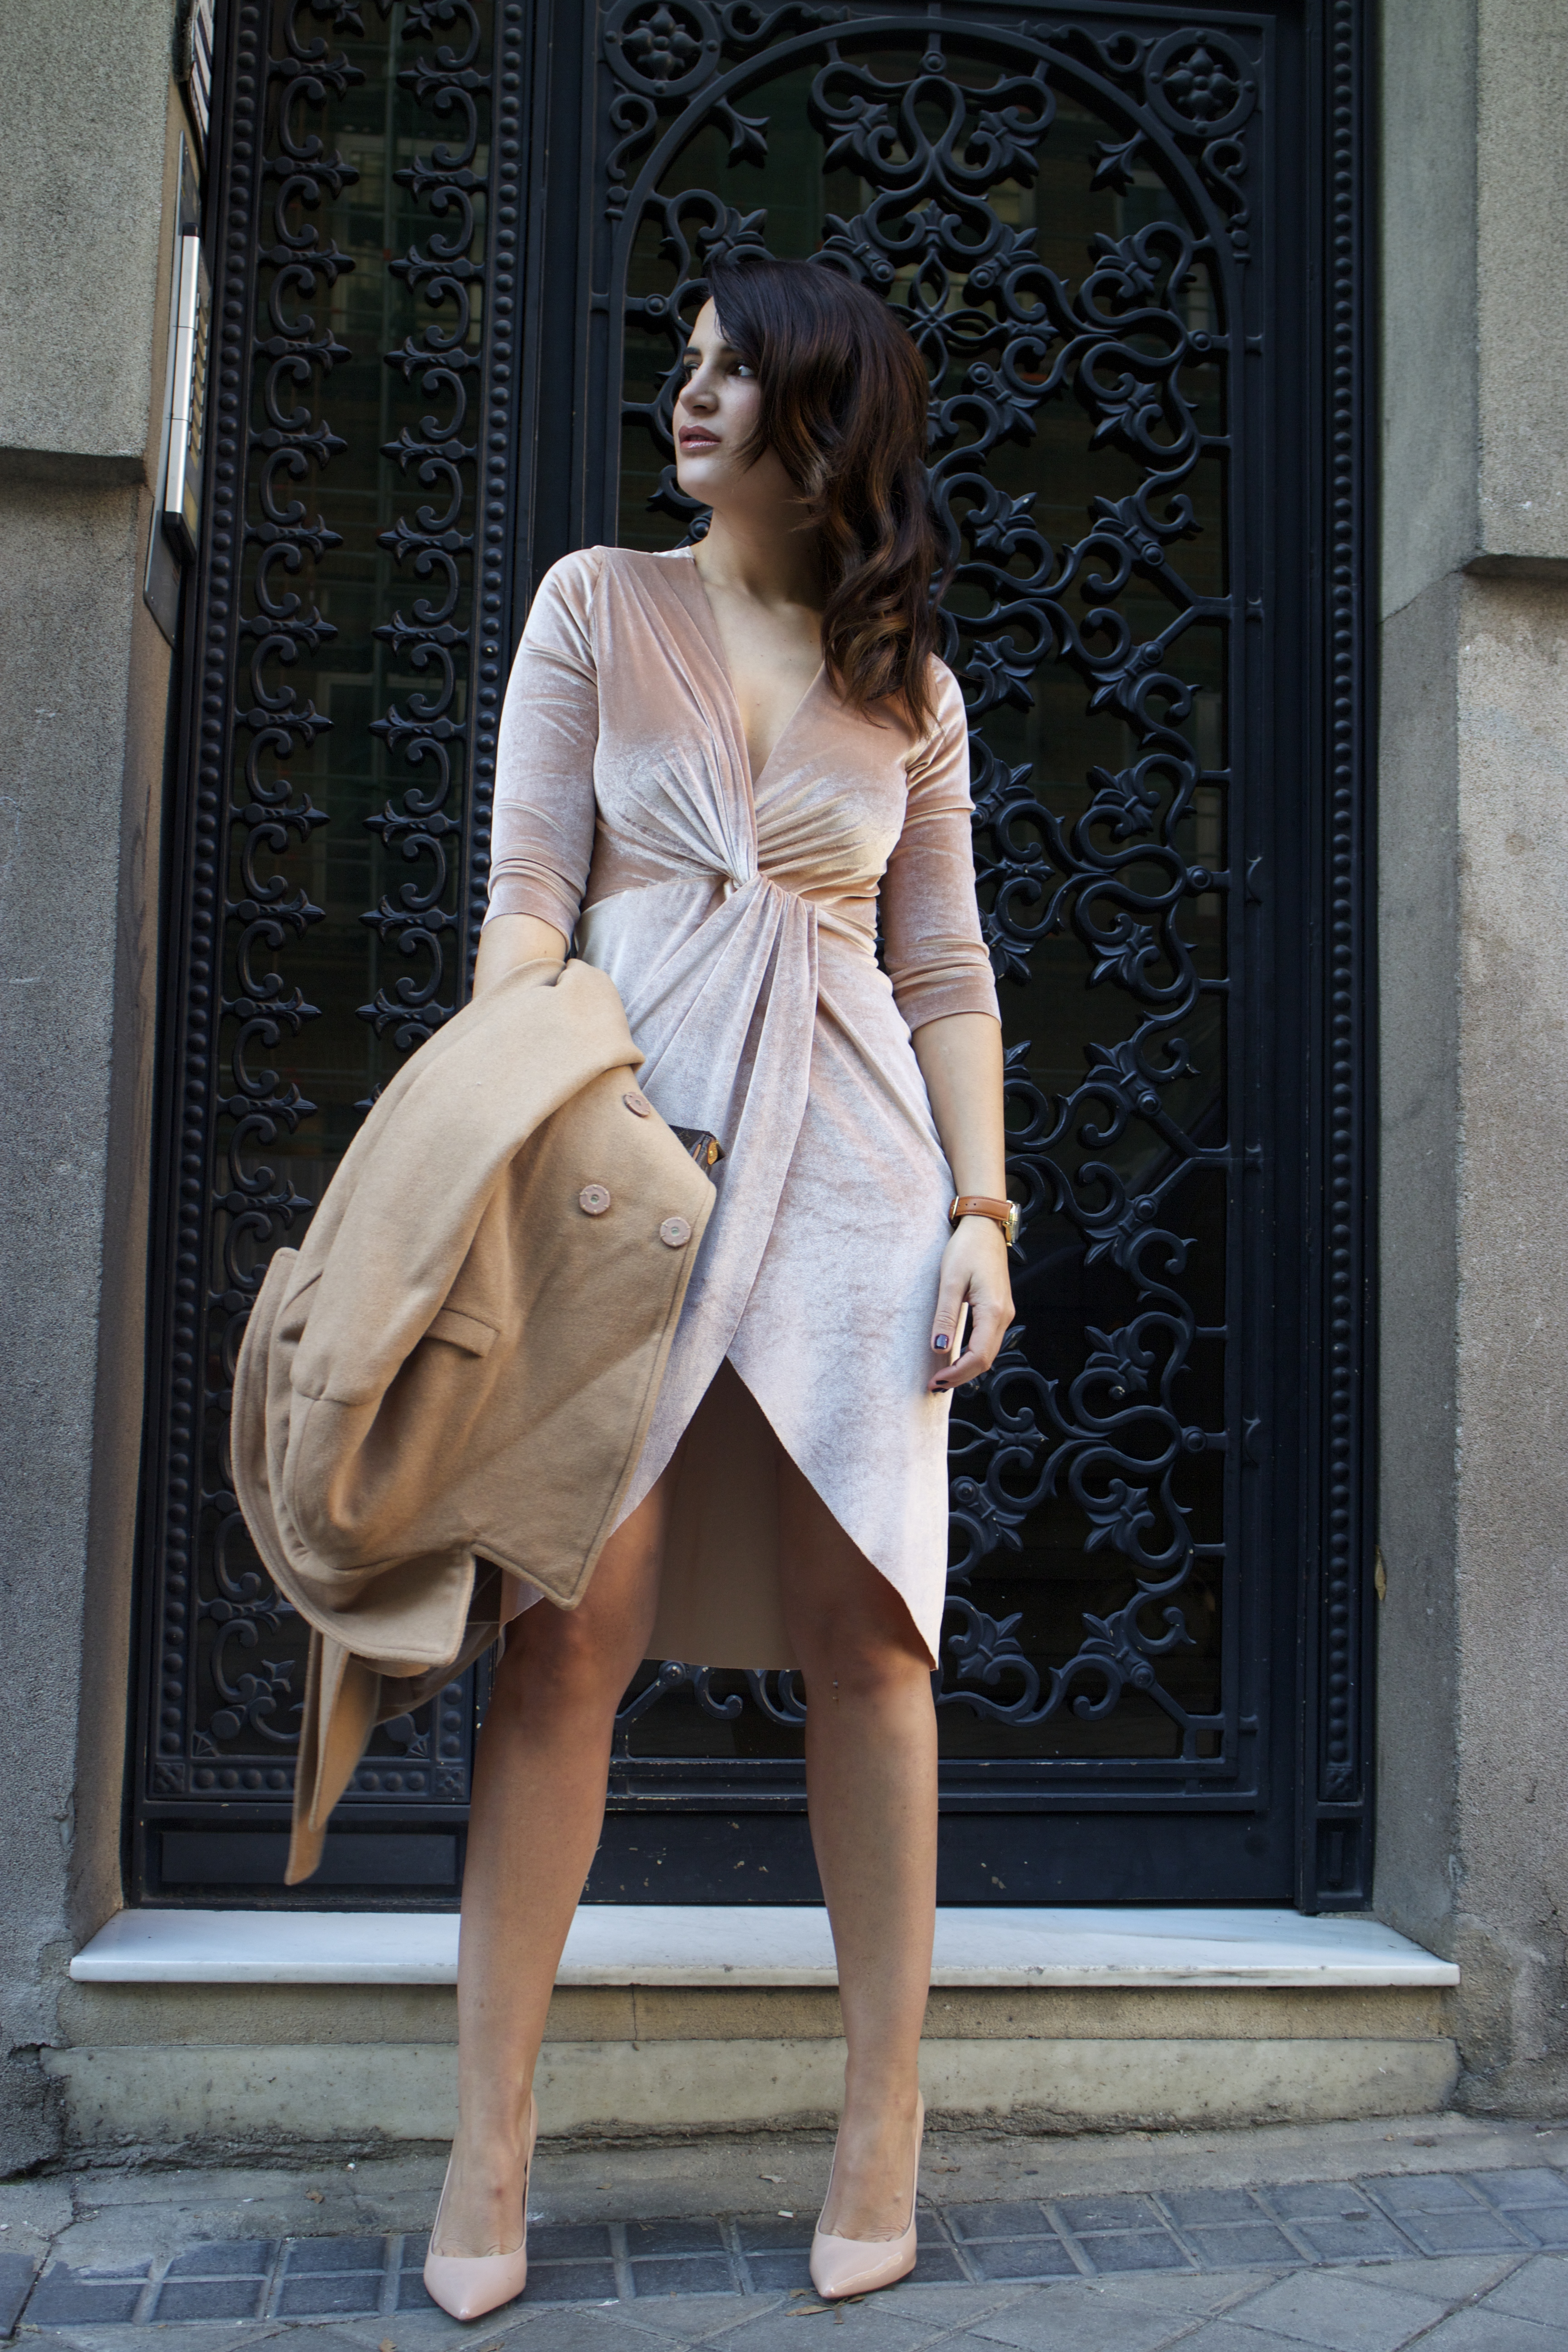 henry-london-watch-brand-embassador-pink-velvet-dress-vuitton-bag-lady-amaras-la-moda-paula-fraile11